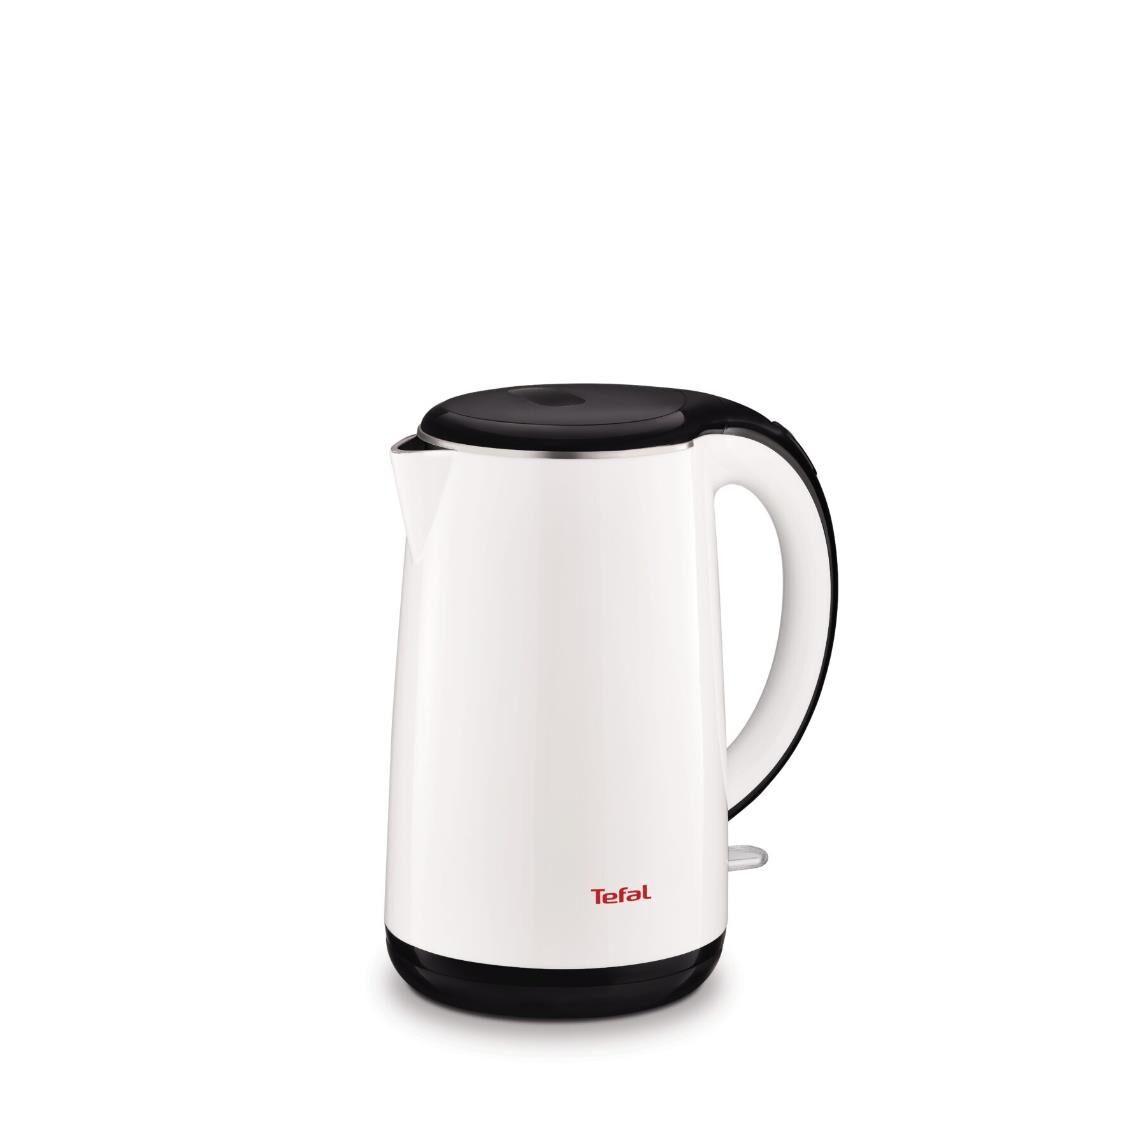 Tefal Safe Tea 17L White KO260165